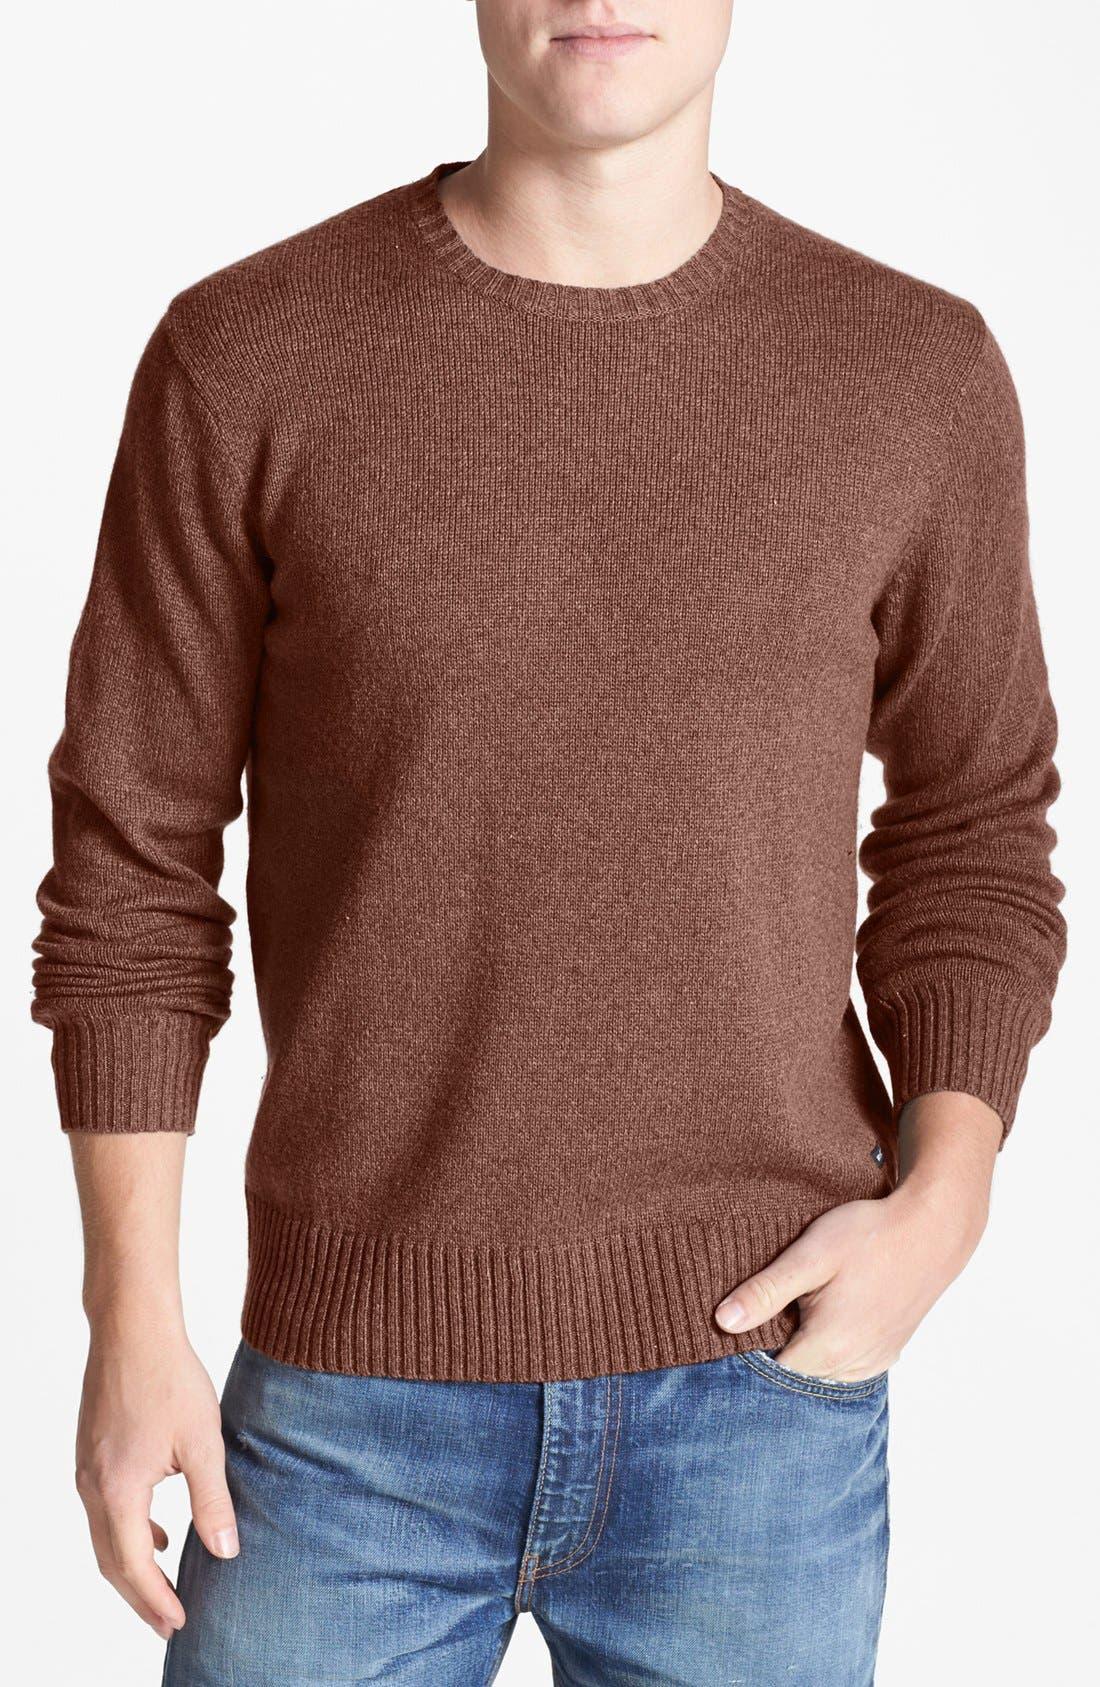 Alternate Image 1 Selected - RVCA 'Briza' Crewneck Sweater